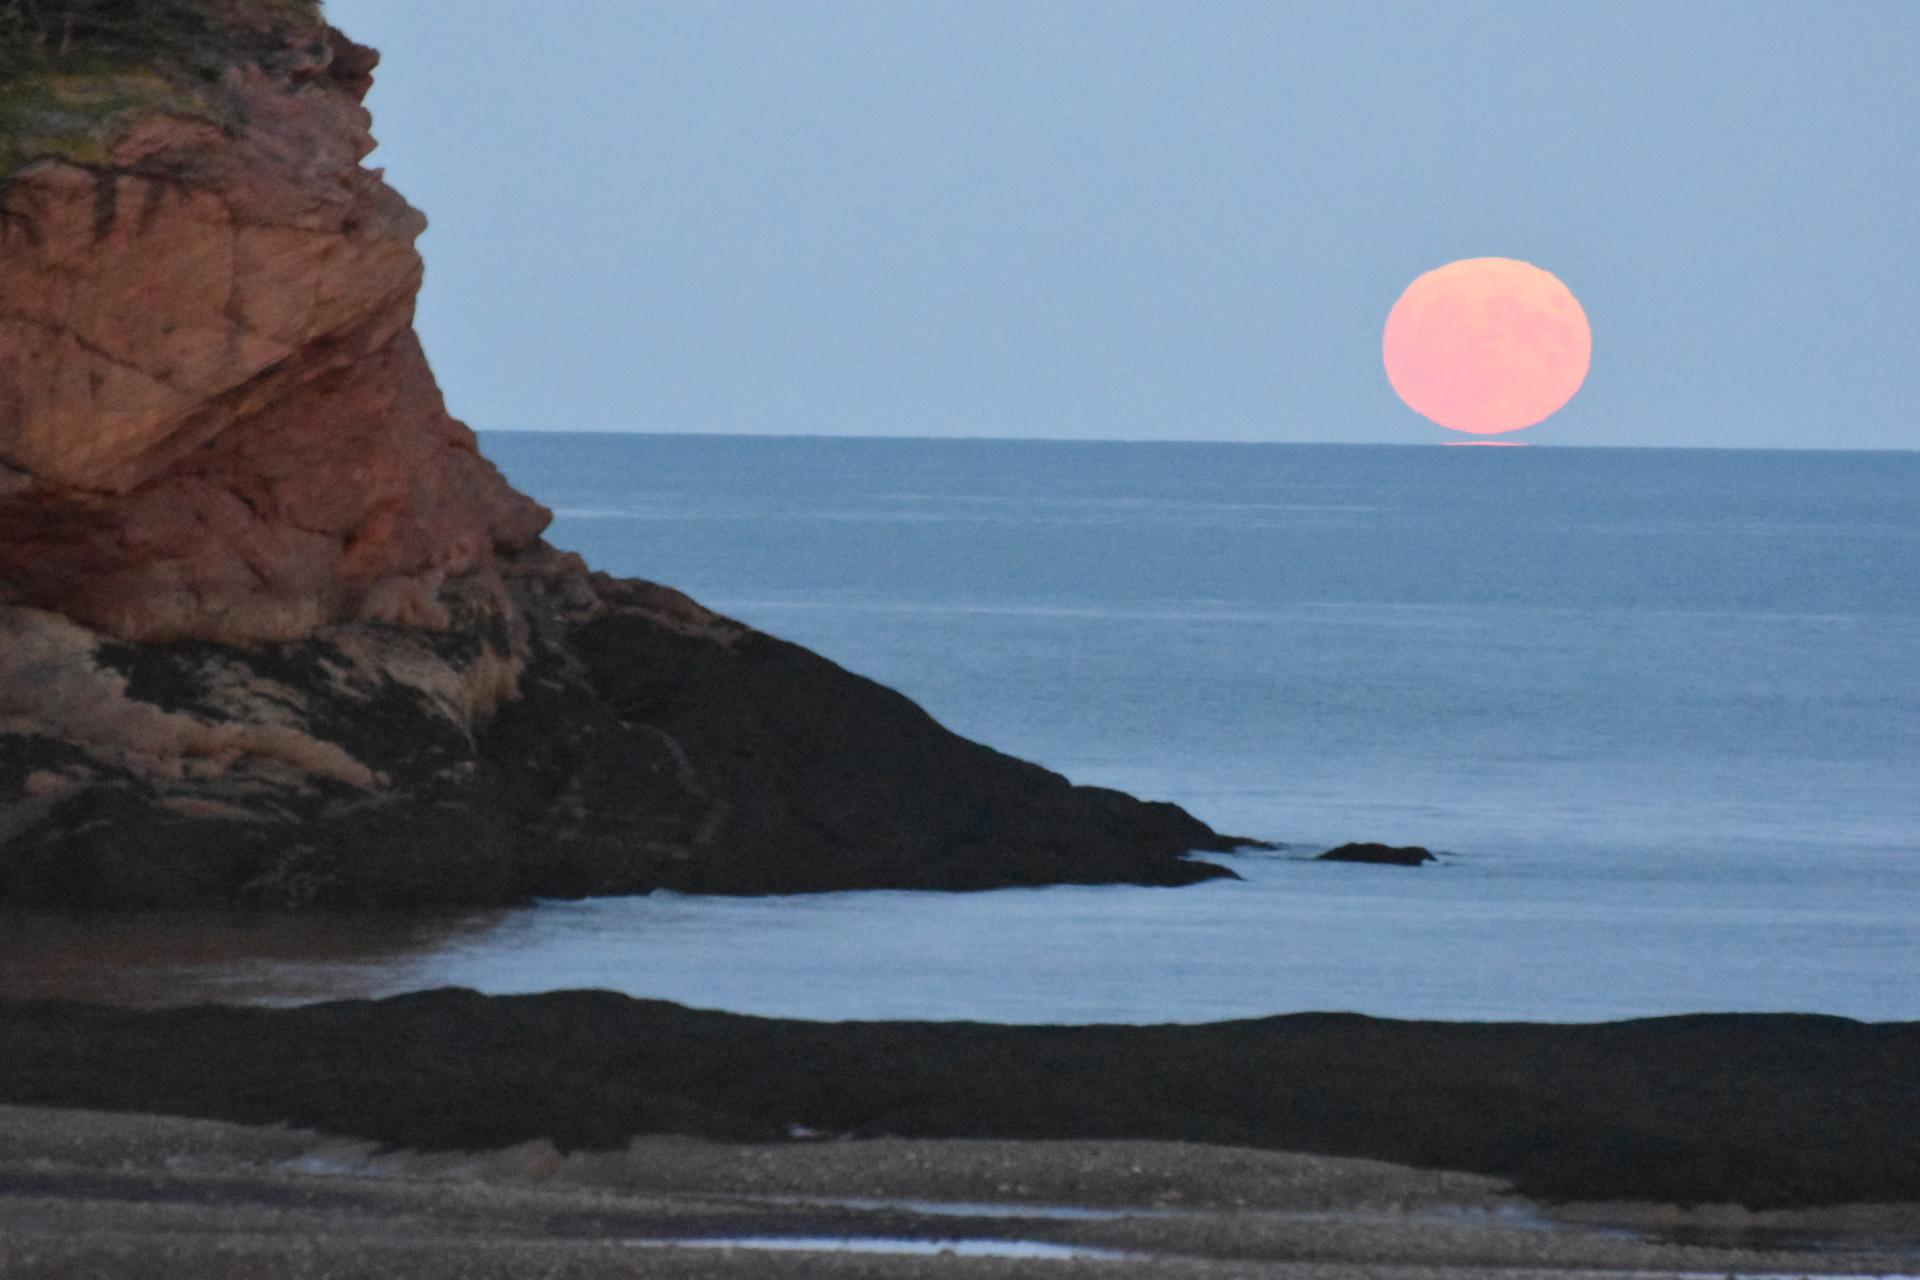 Moonrise over rocky shore